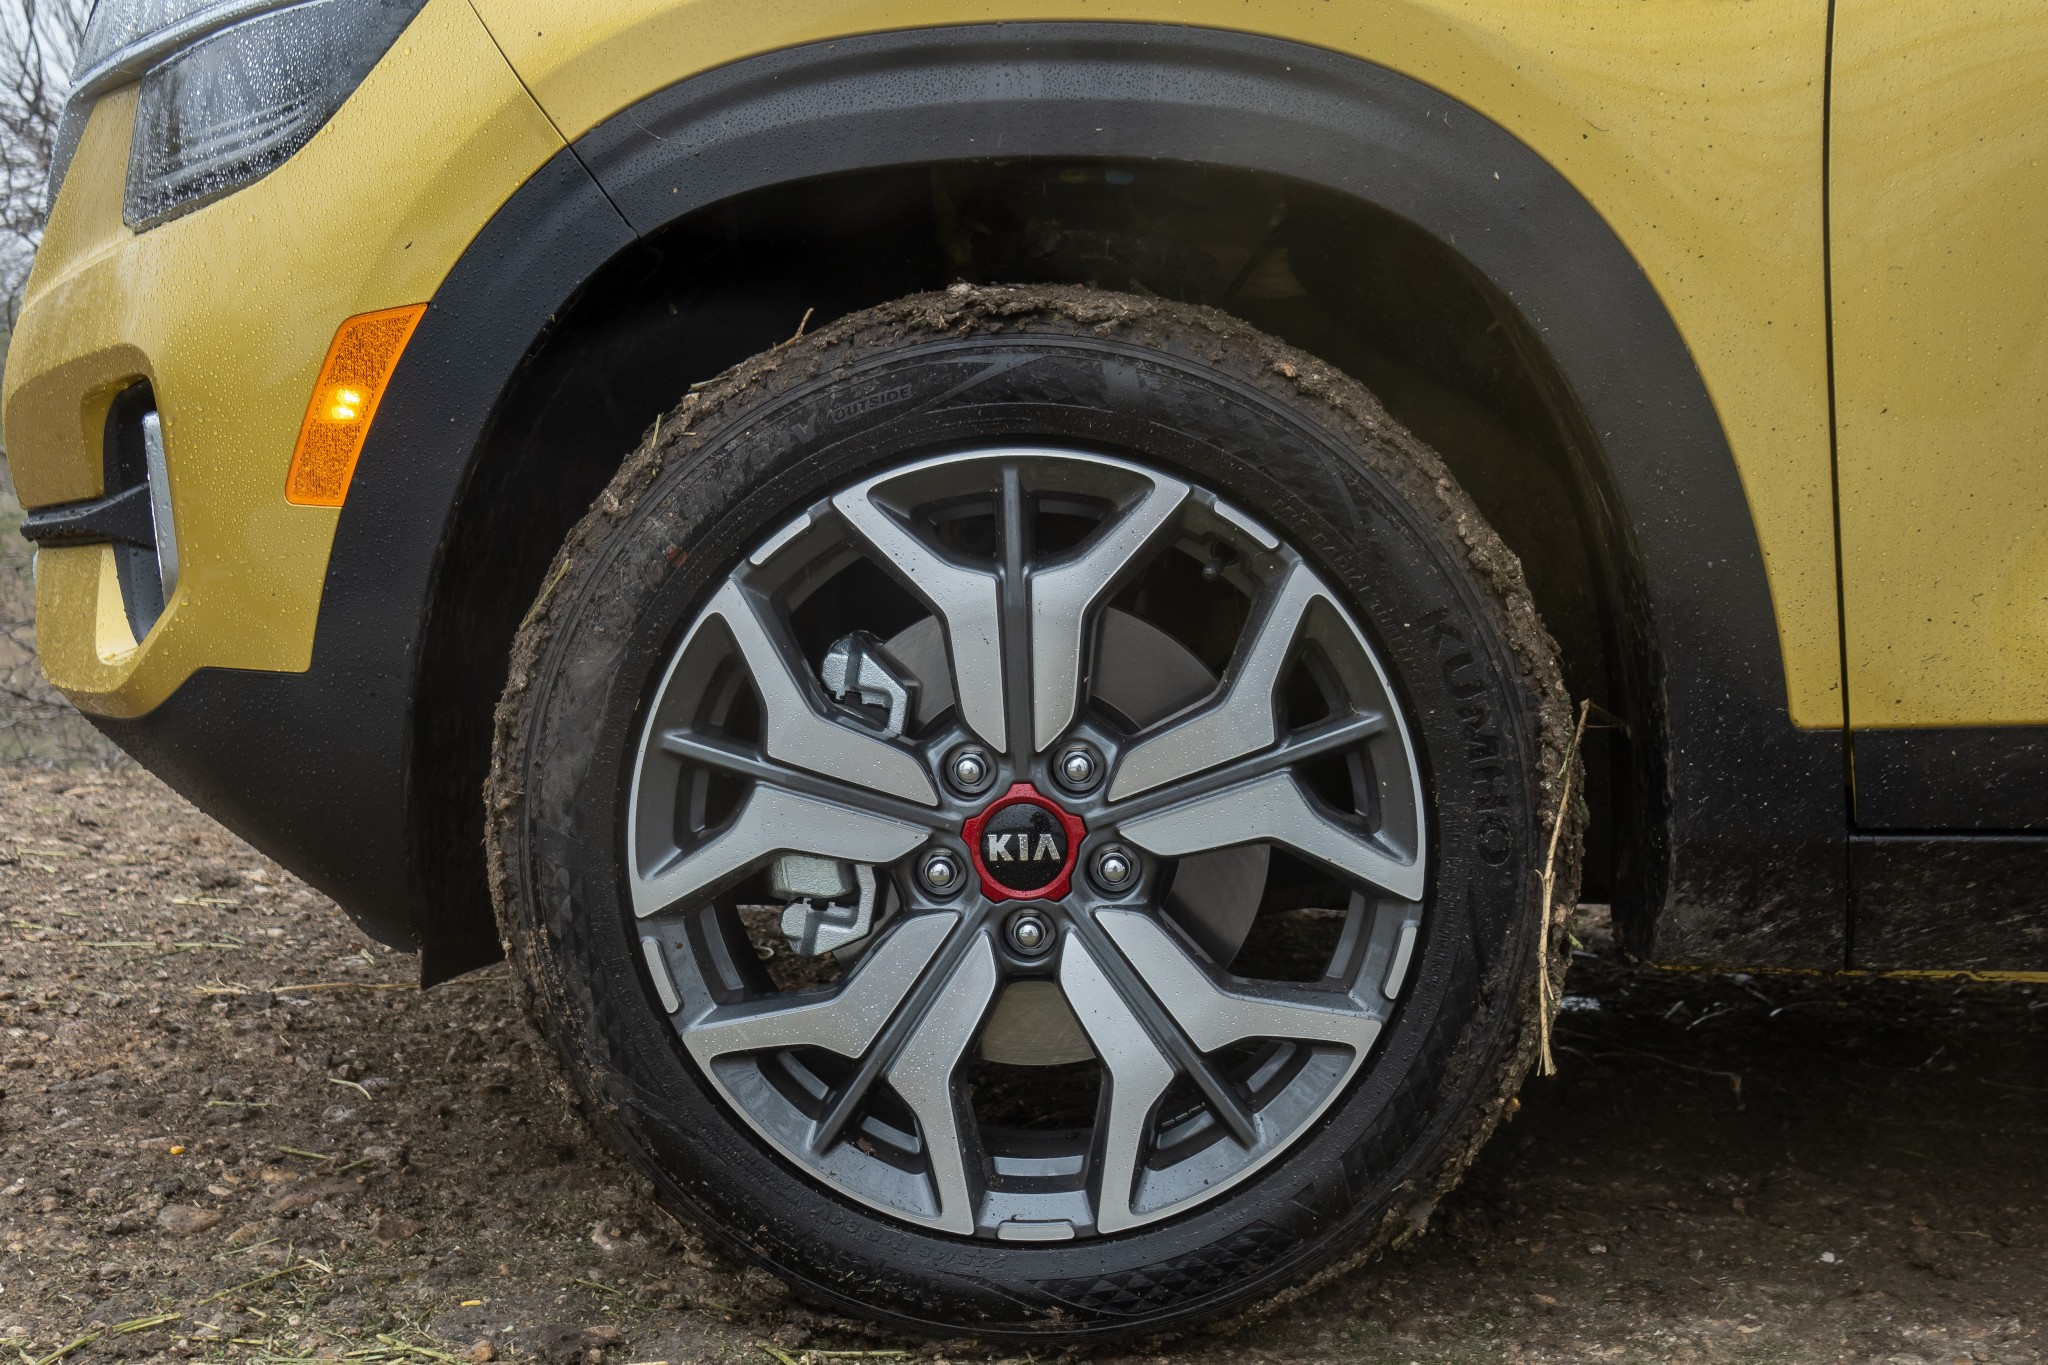 kia-seltos-2021-18-badge--exterior--mud--outdoors--wheel.jpg